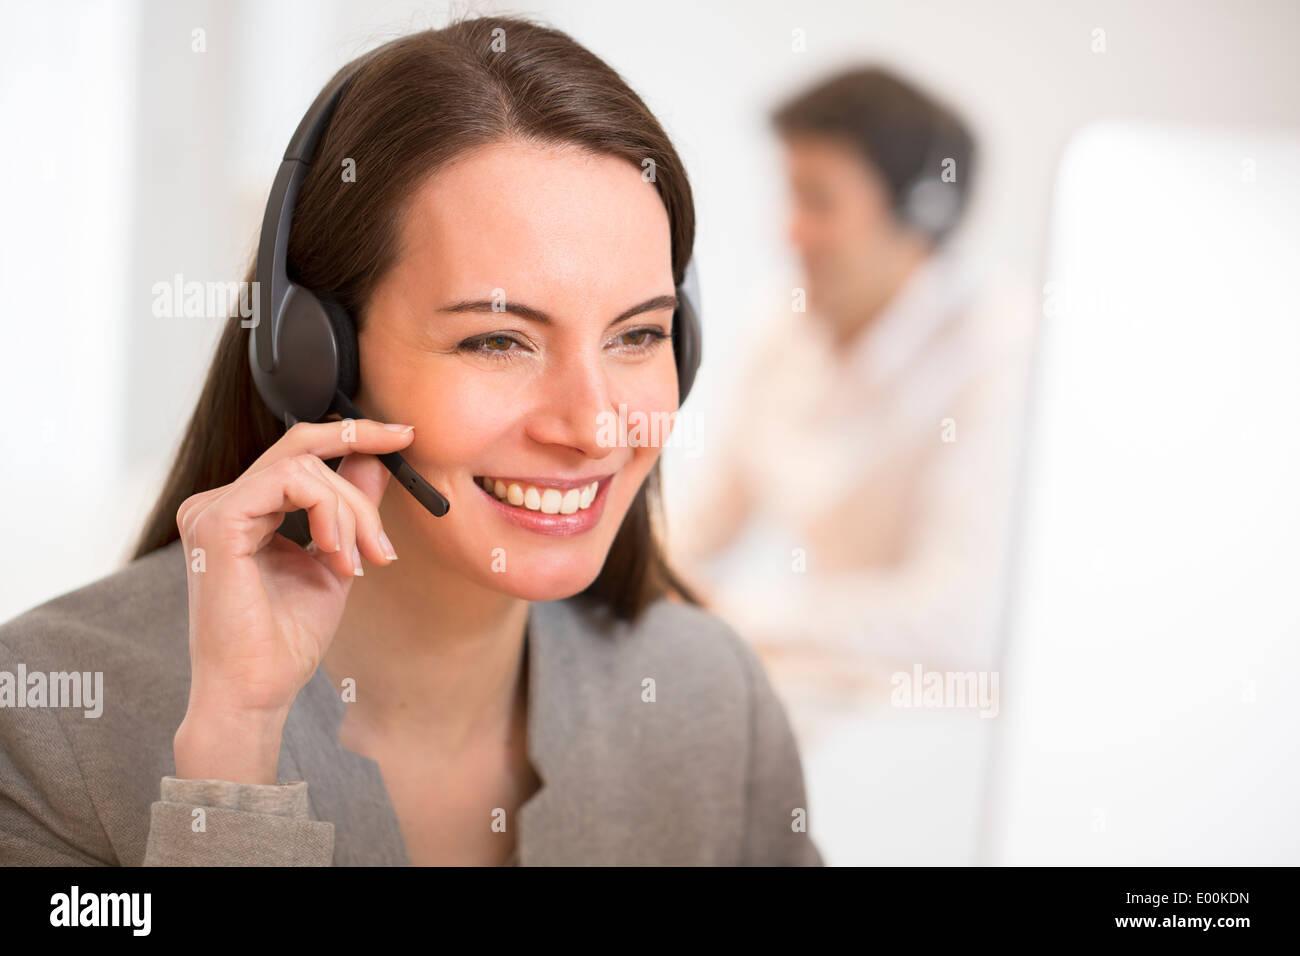 smiling Female pretty desk headphone portrait - Stock Image